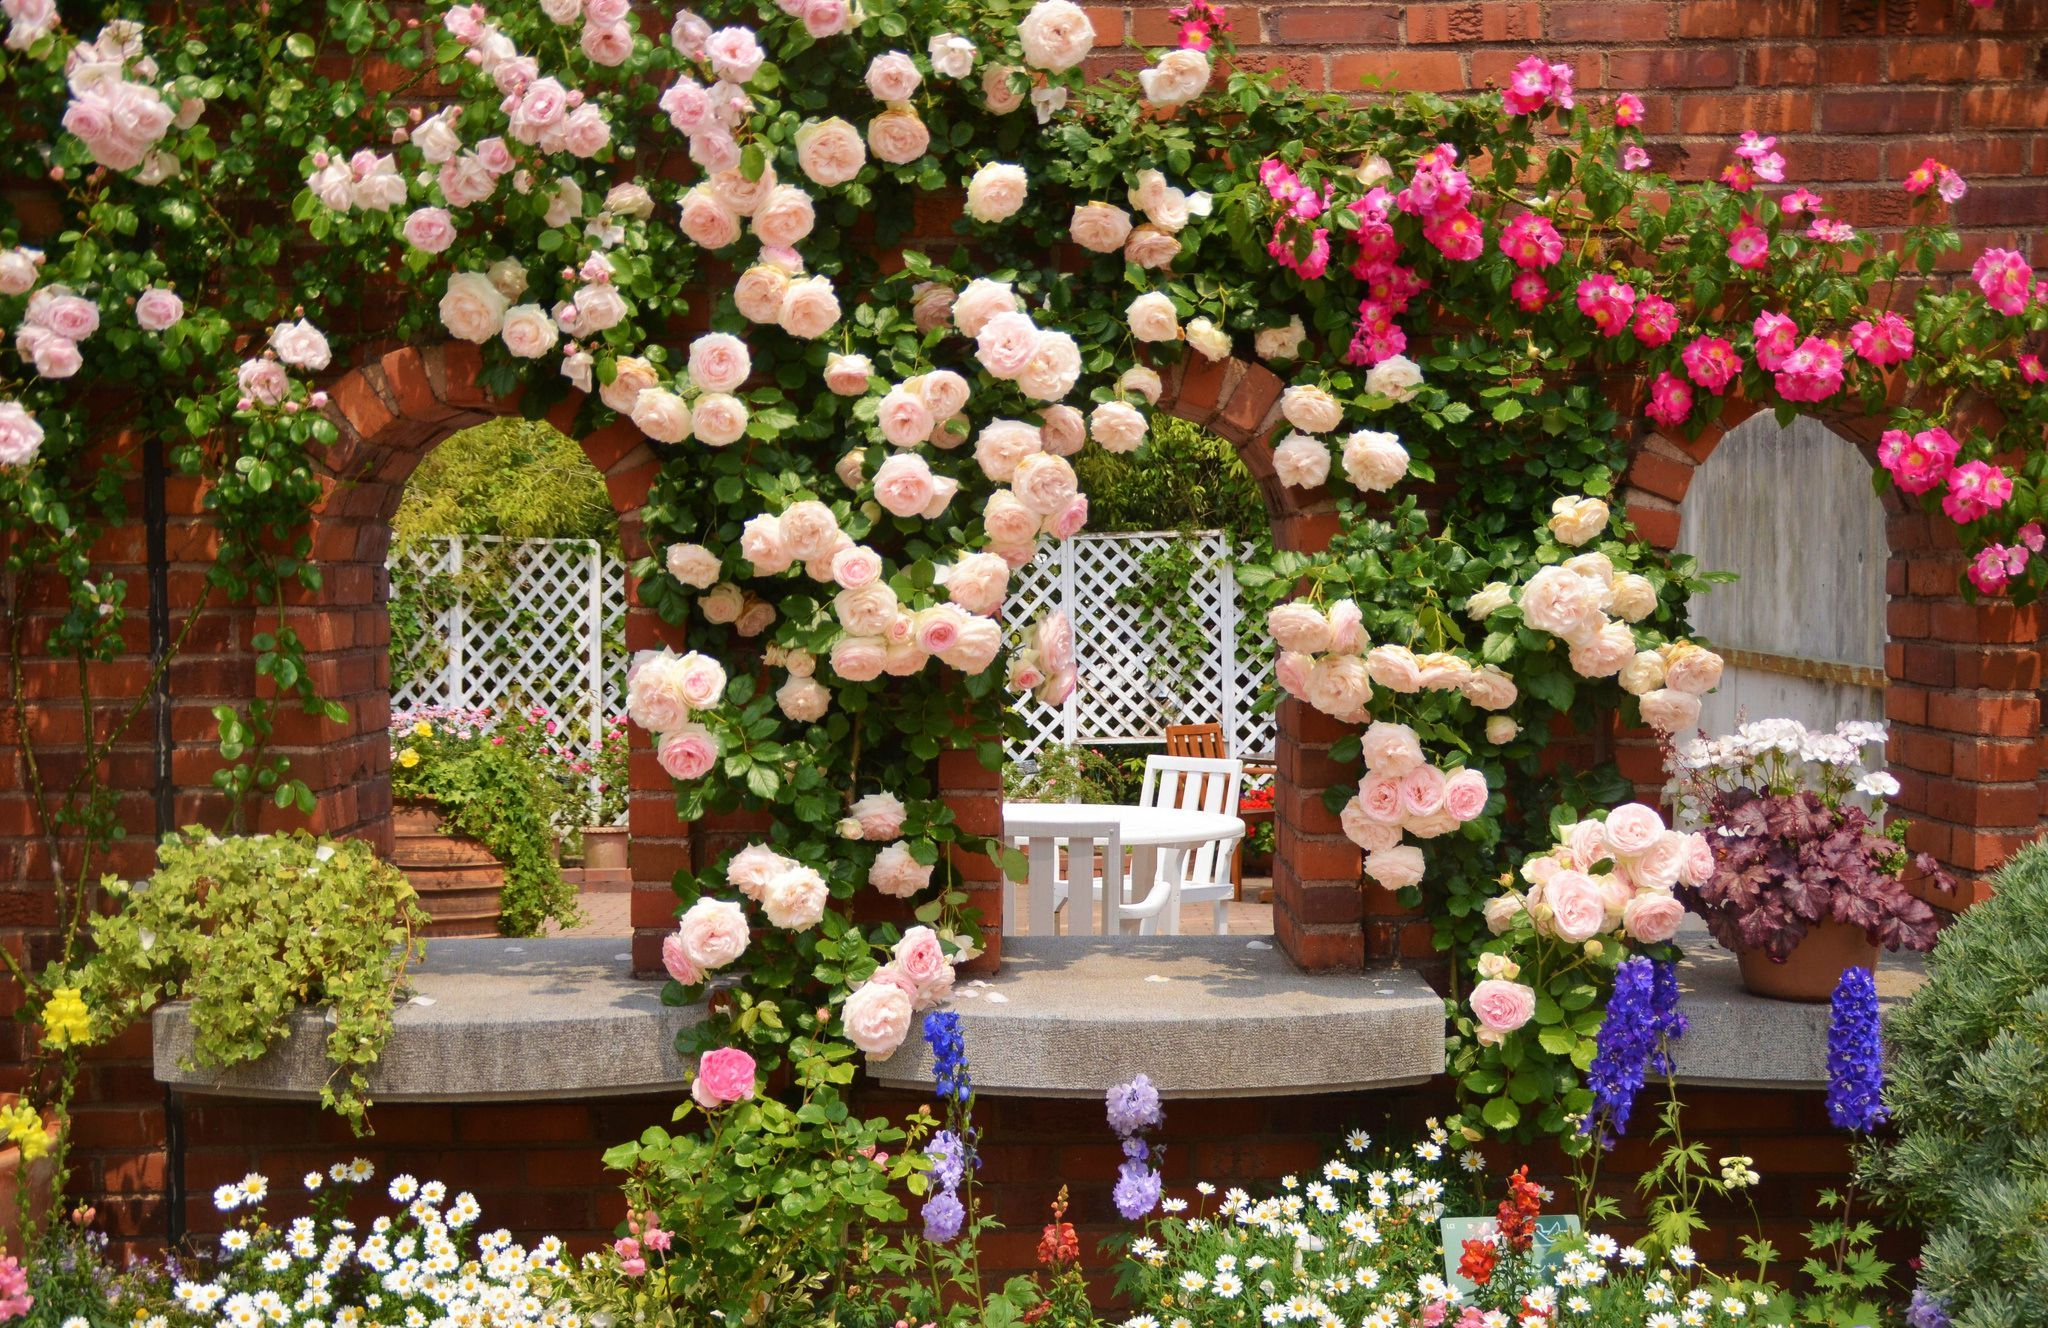 Pink Rose Garden Wallpaper rose garden desktop background | 1750 | hostelgarden | 10